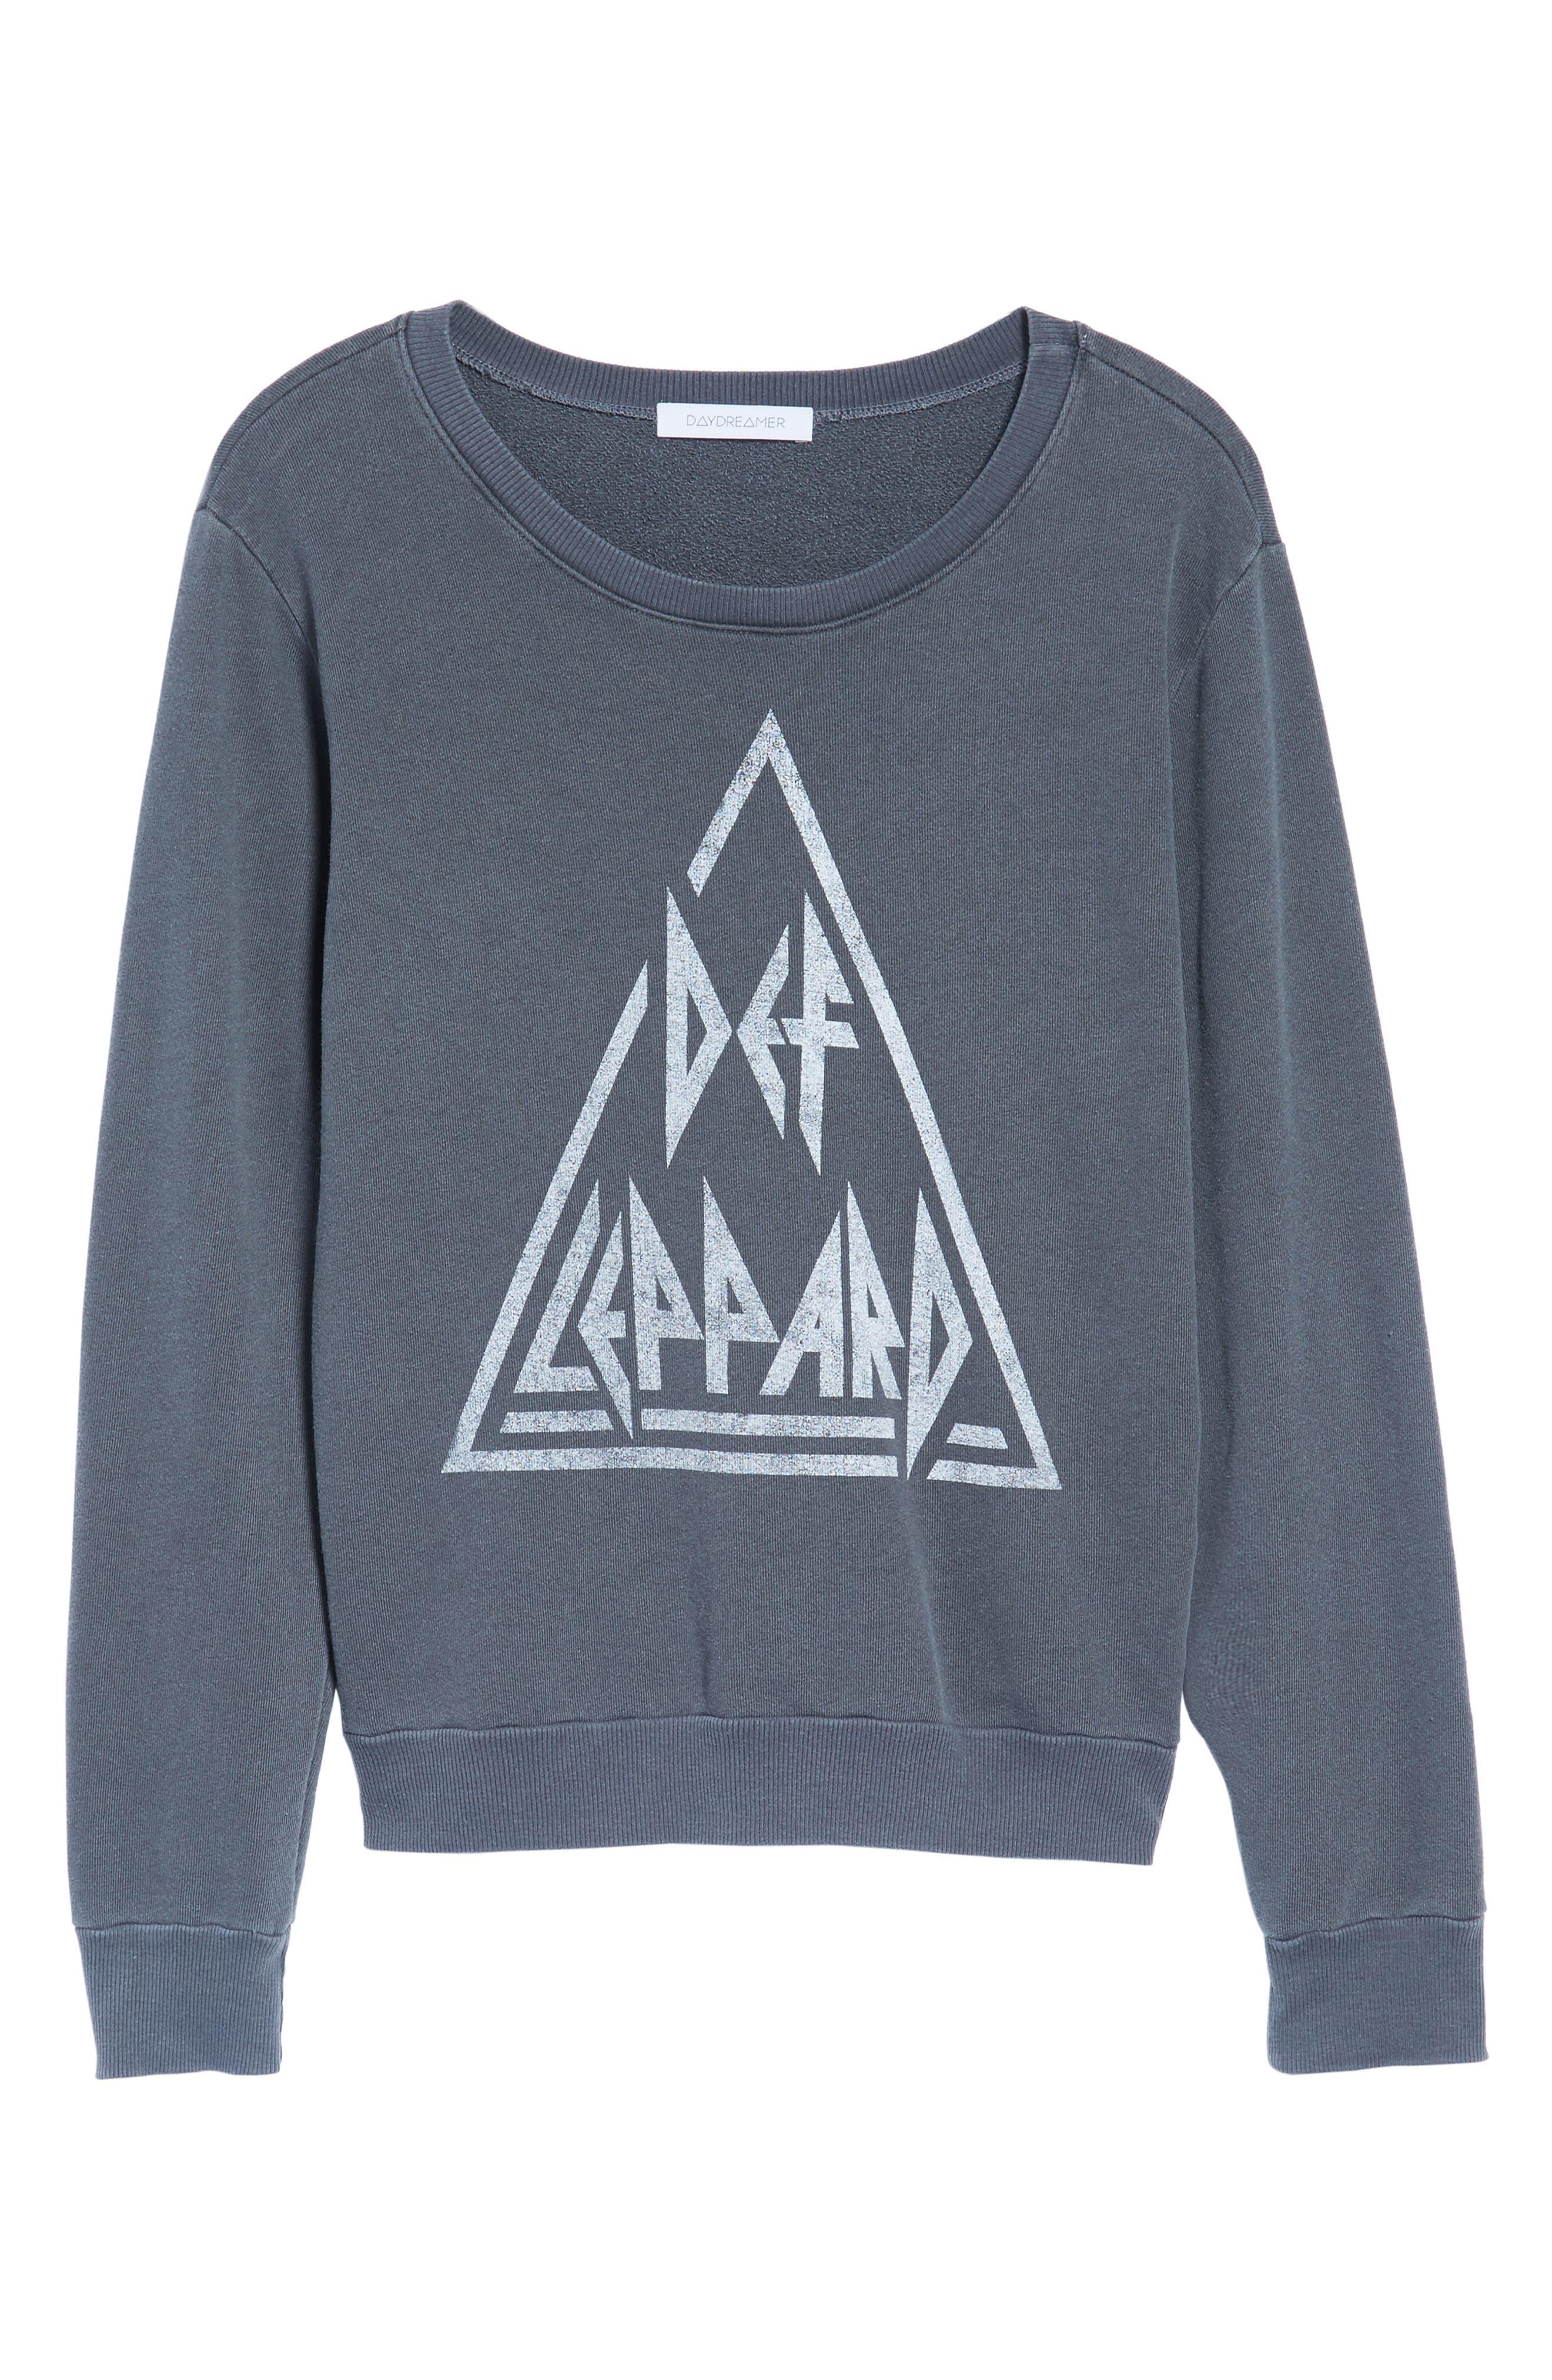 Def Leppard Sweatshirt,                             Alternate thumbnail 6, color,